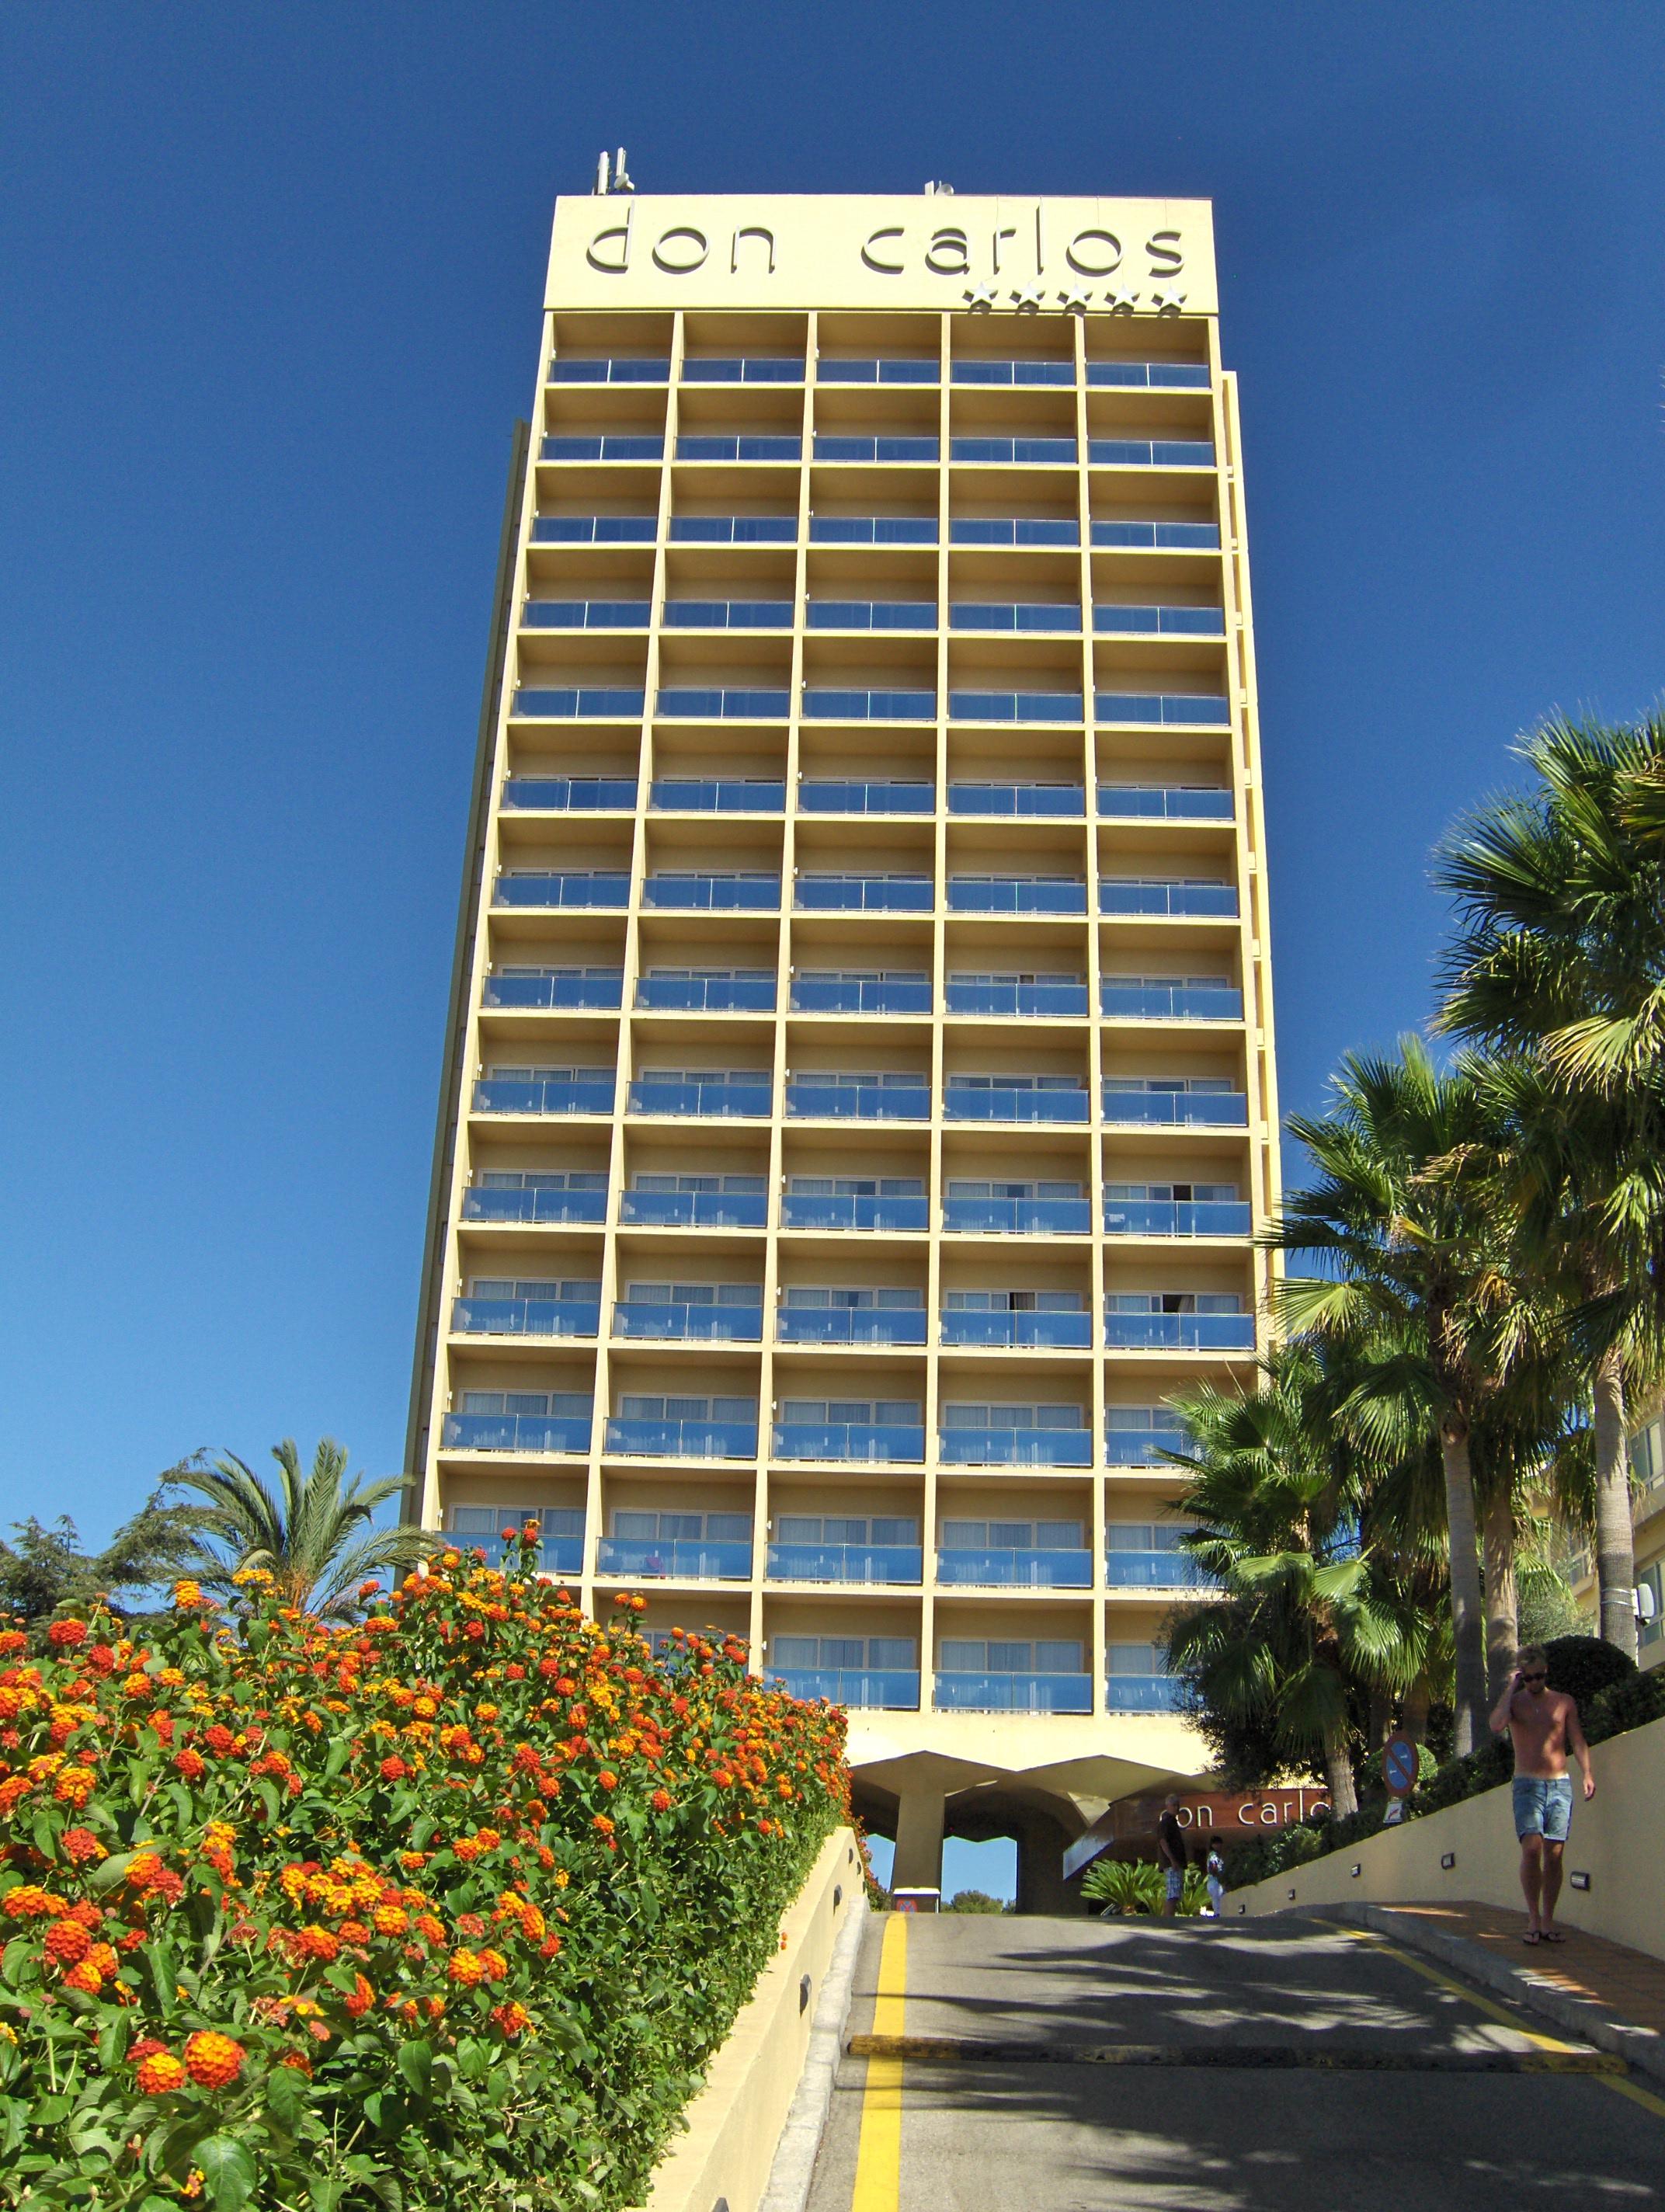 Don Carlos Hotel Spain